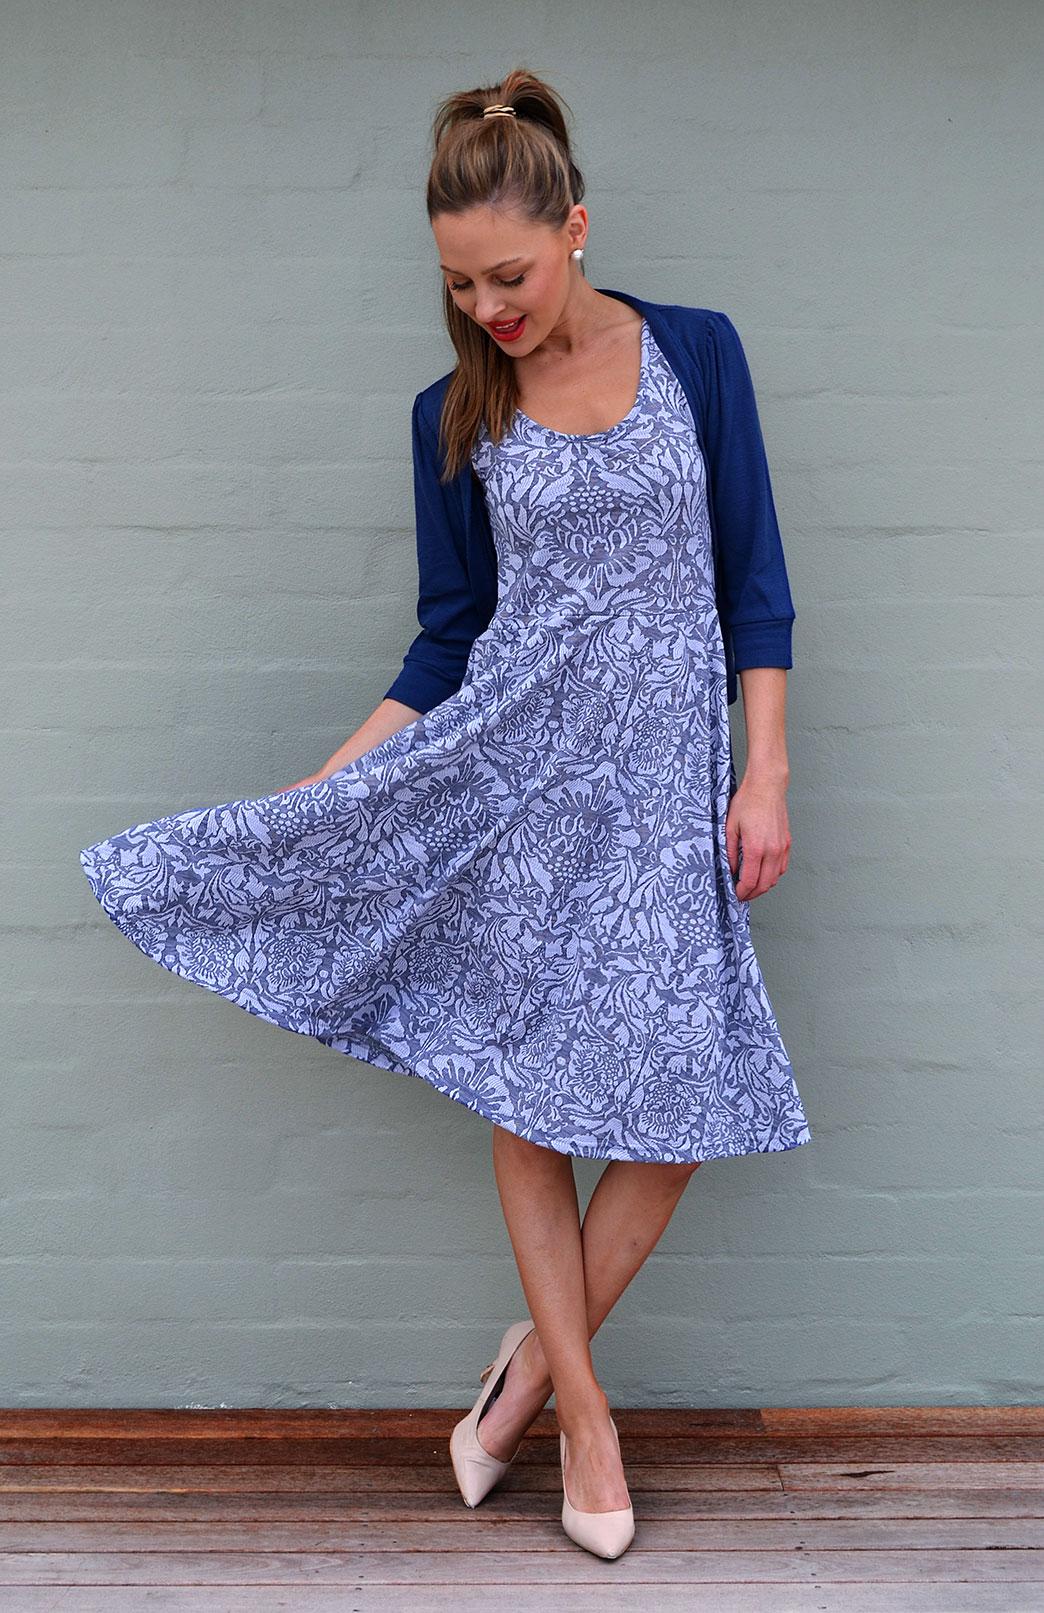 Crop Cardigan - 3/4 Sleeve - Women's Blue Night Crop Short Cardigan with 3/4 Sleeves and Buttons - Smitten Merino Tasmania Australia